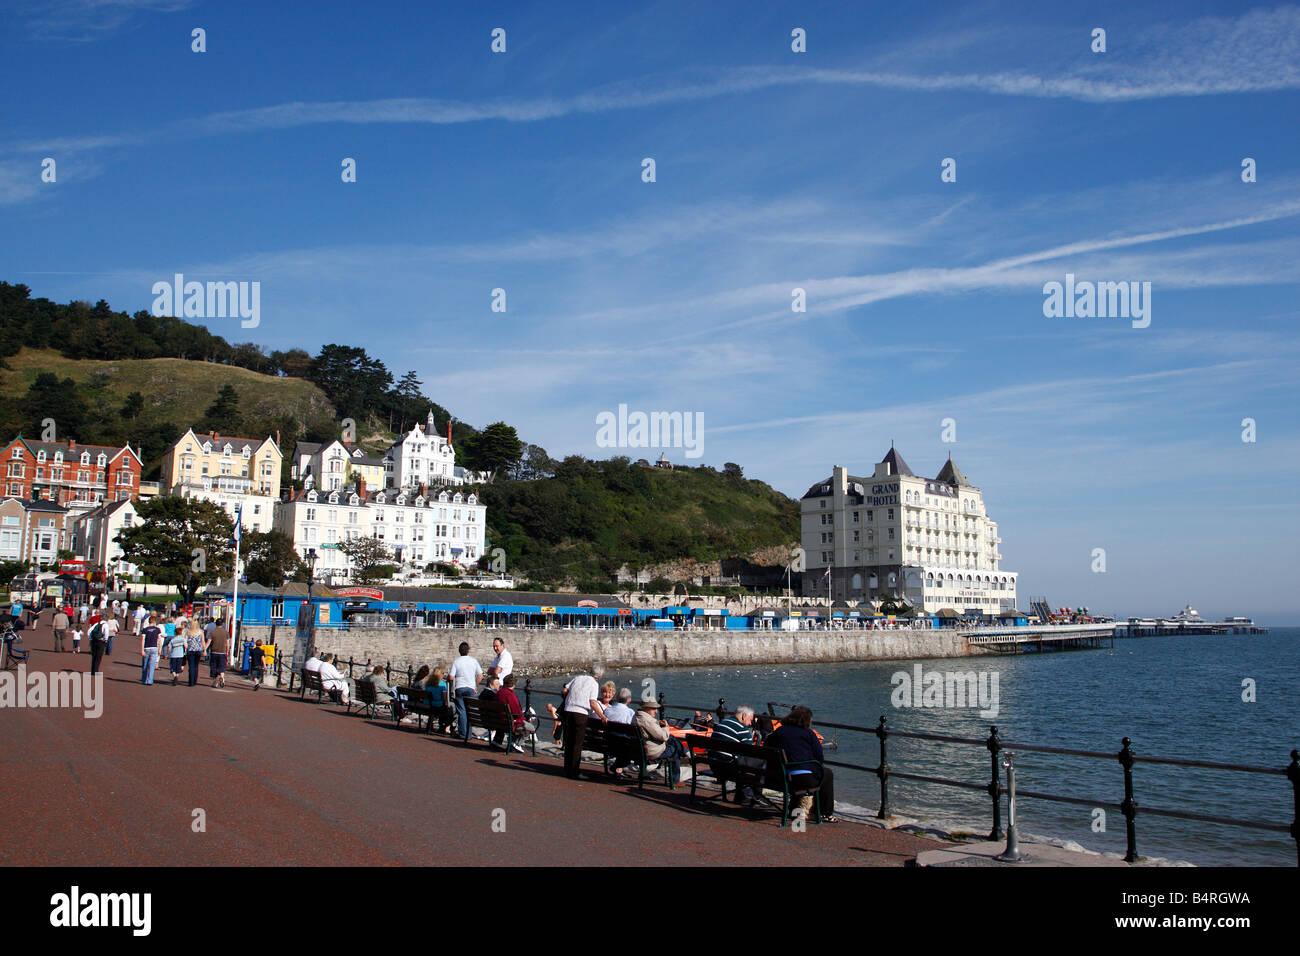 view towards the pier along the parade north shore llandudno conway clwyd north wales uk - Stock Image